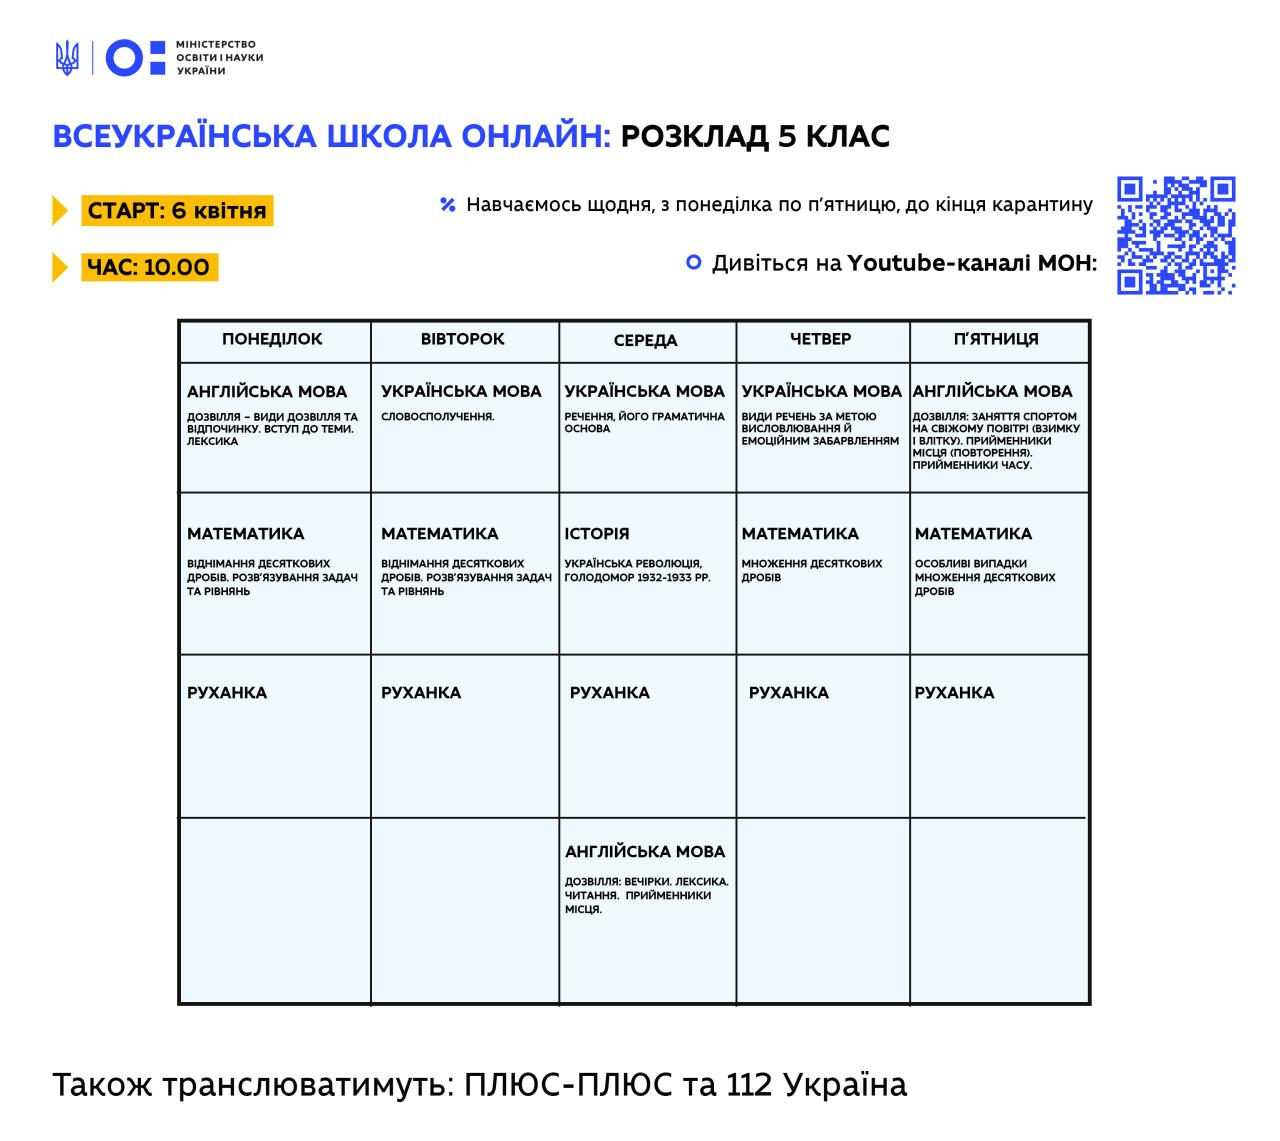 "Расписание уроков онлайн 5 класс: ""Всеукраинская школа онлайн"" / Фото: МОН"